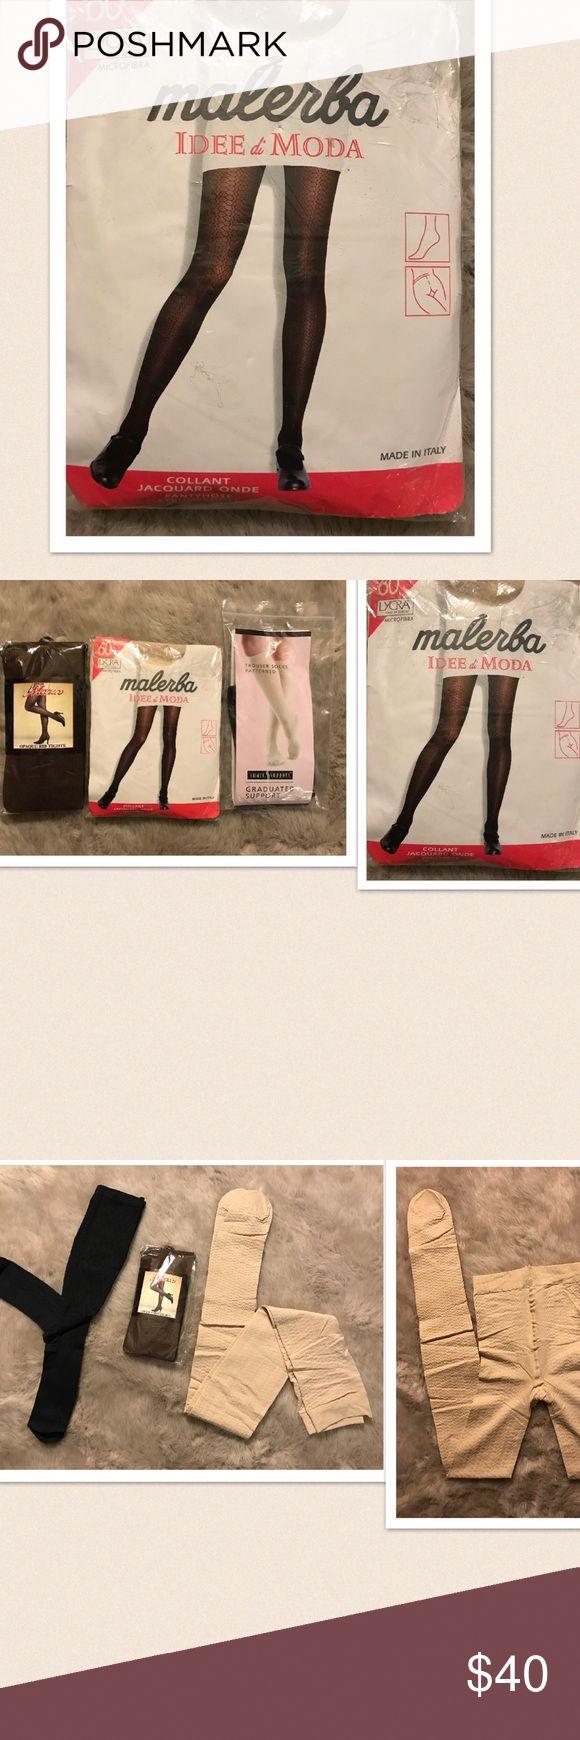 "Malerba Idee di Moda You will receive 1 Malerba Idee di Moda. Jacquard design. Thick pantyhose. Size: Medium. 1 Smart support trouser patterned socks. Size: Women's 5.5-7.5. Color: Black. 1 Maria Opaque Rib Tights. Size: One size fits. 5'-5' 10"" 100-180 lbs. Color: Brown. New. Malerba Accessories Hosiery & Socks"